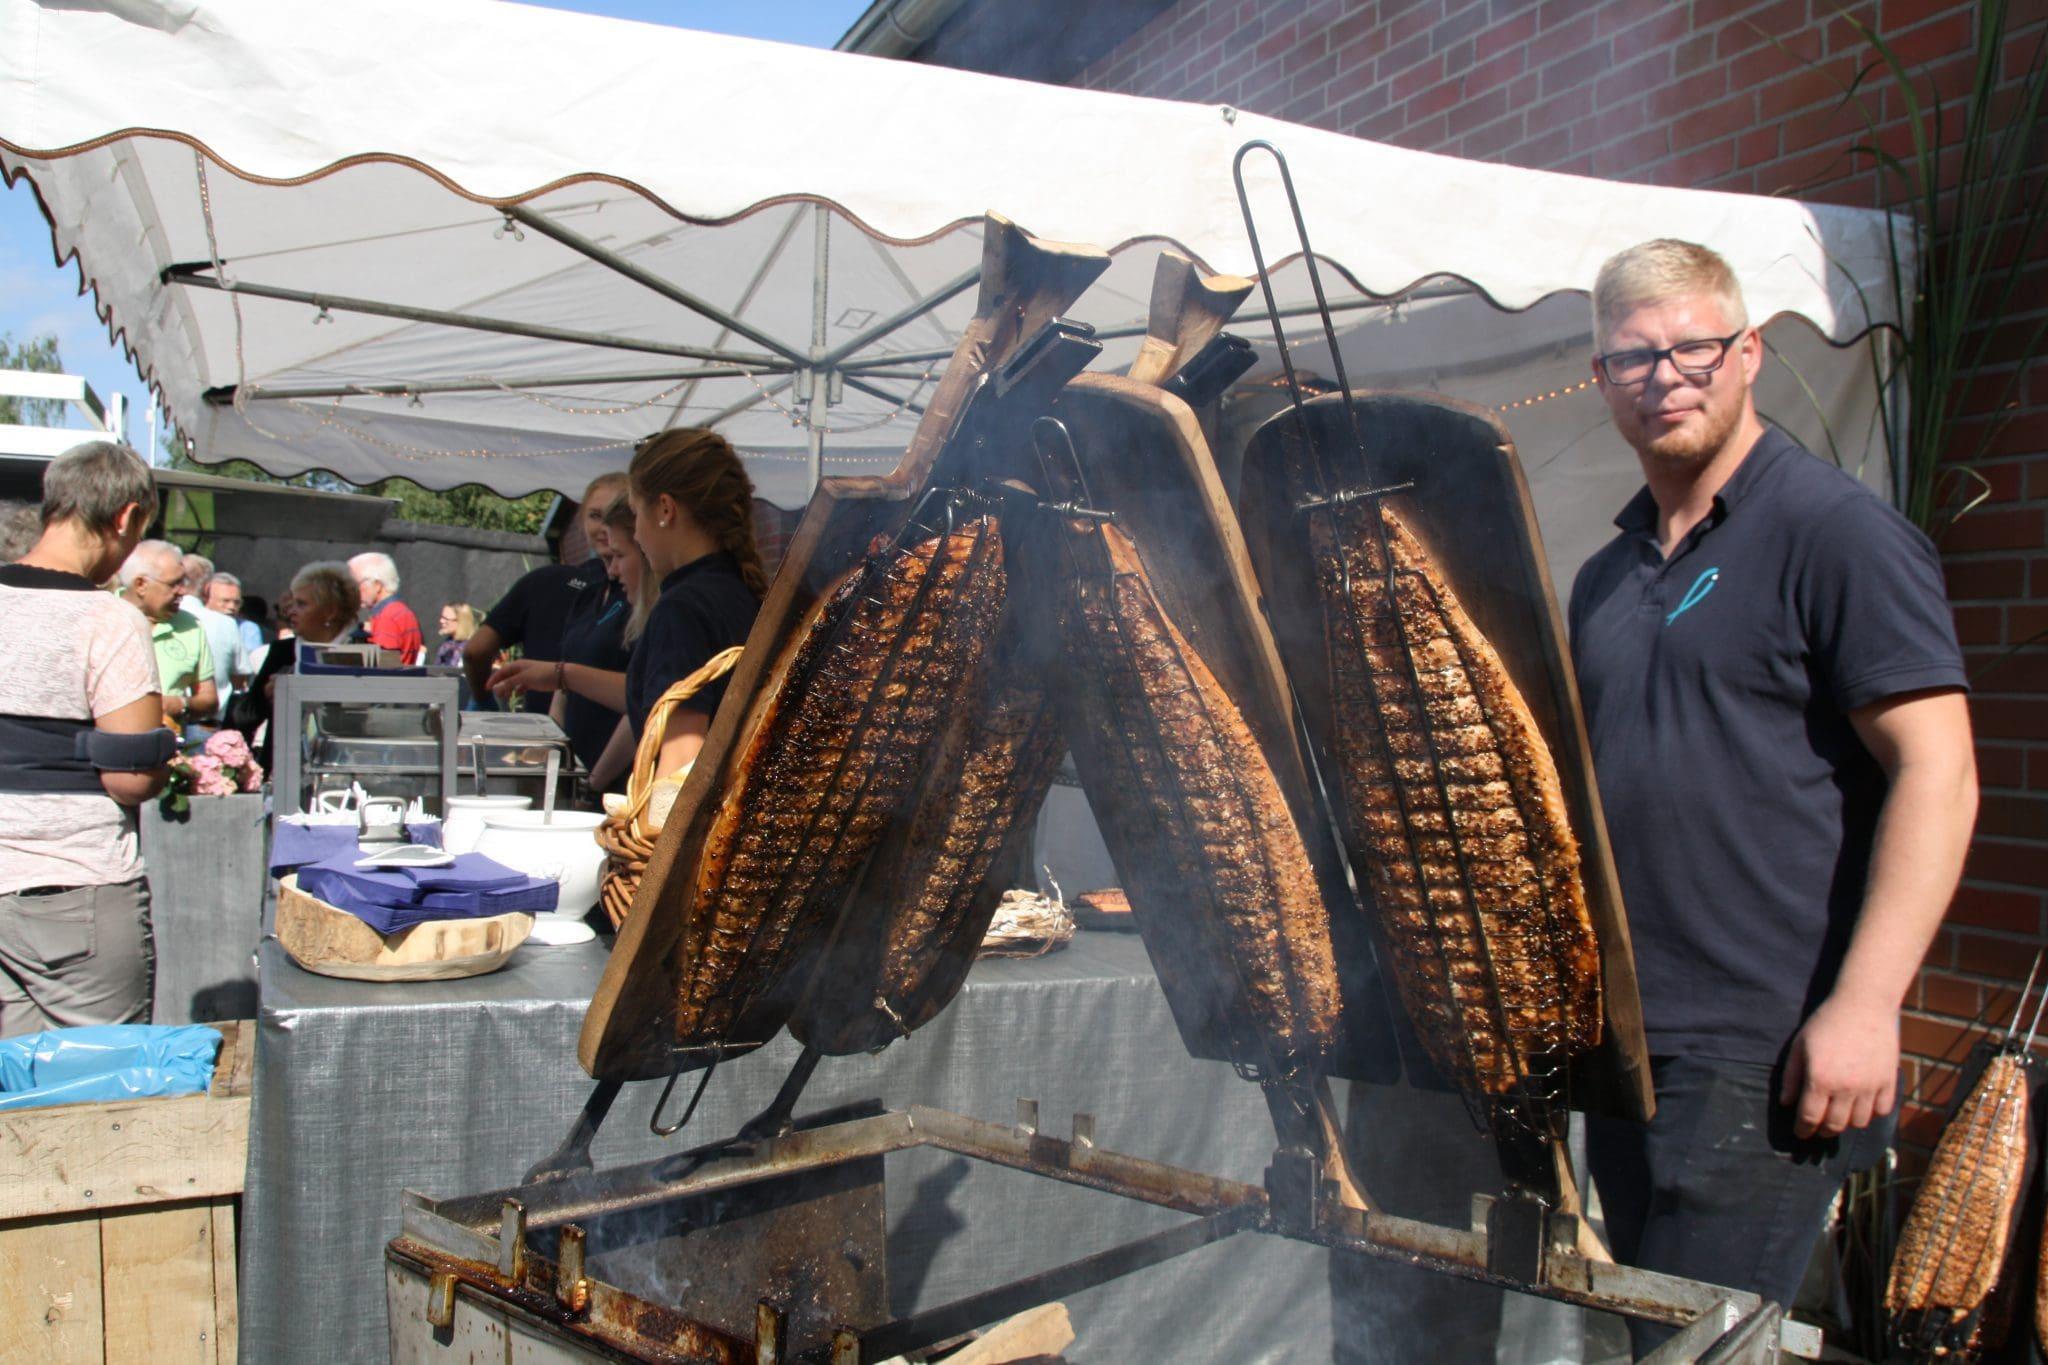 Dorffest in Wiehagen